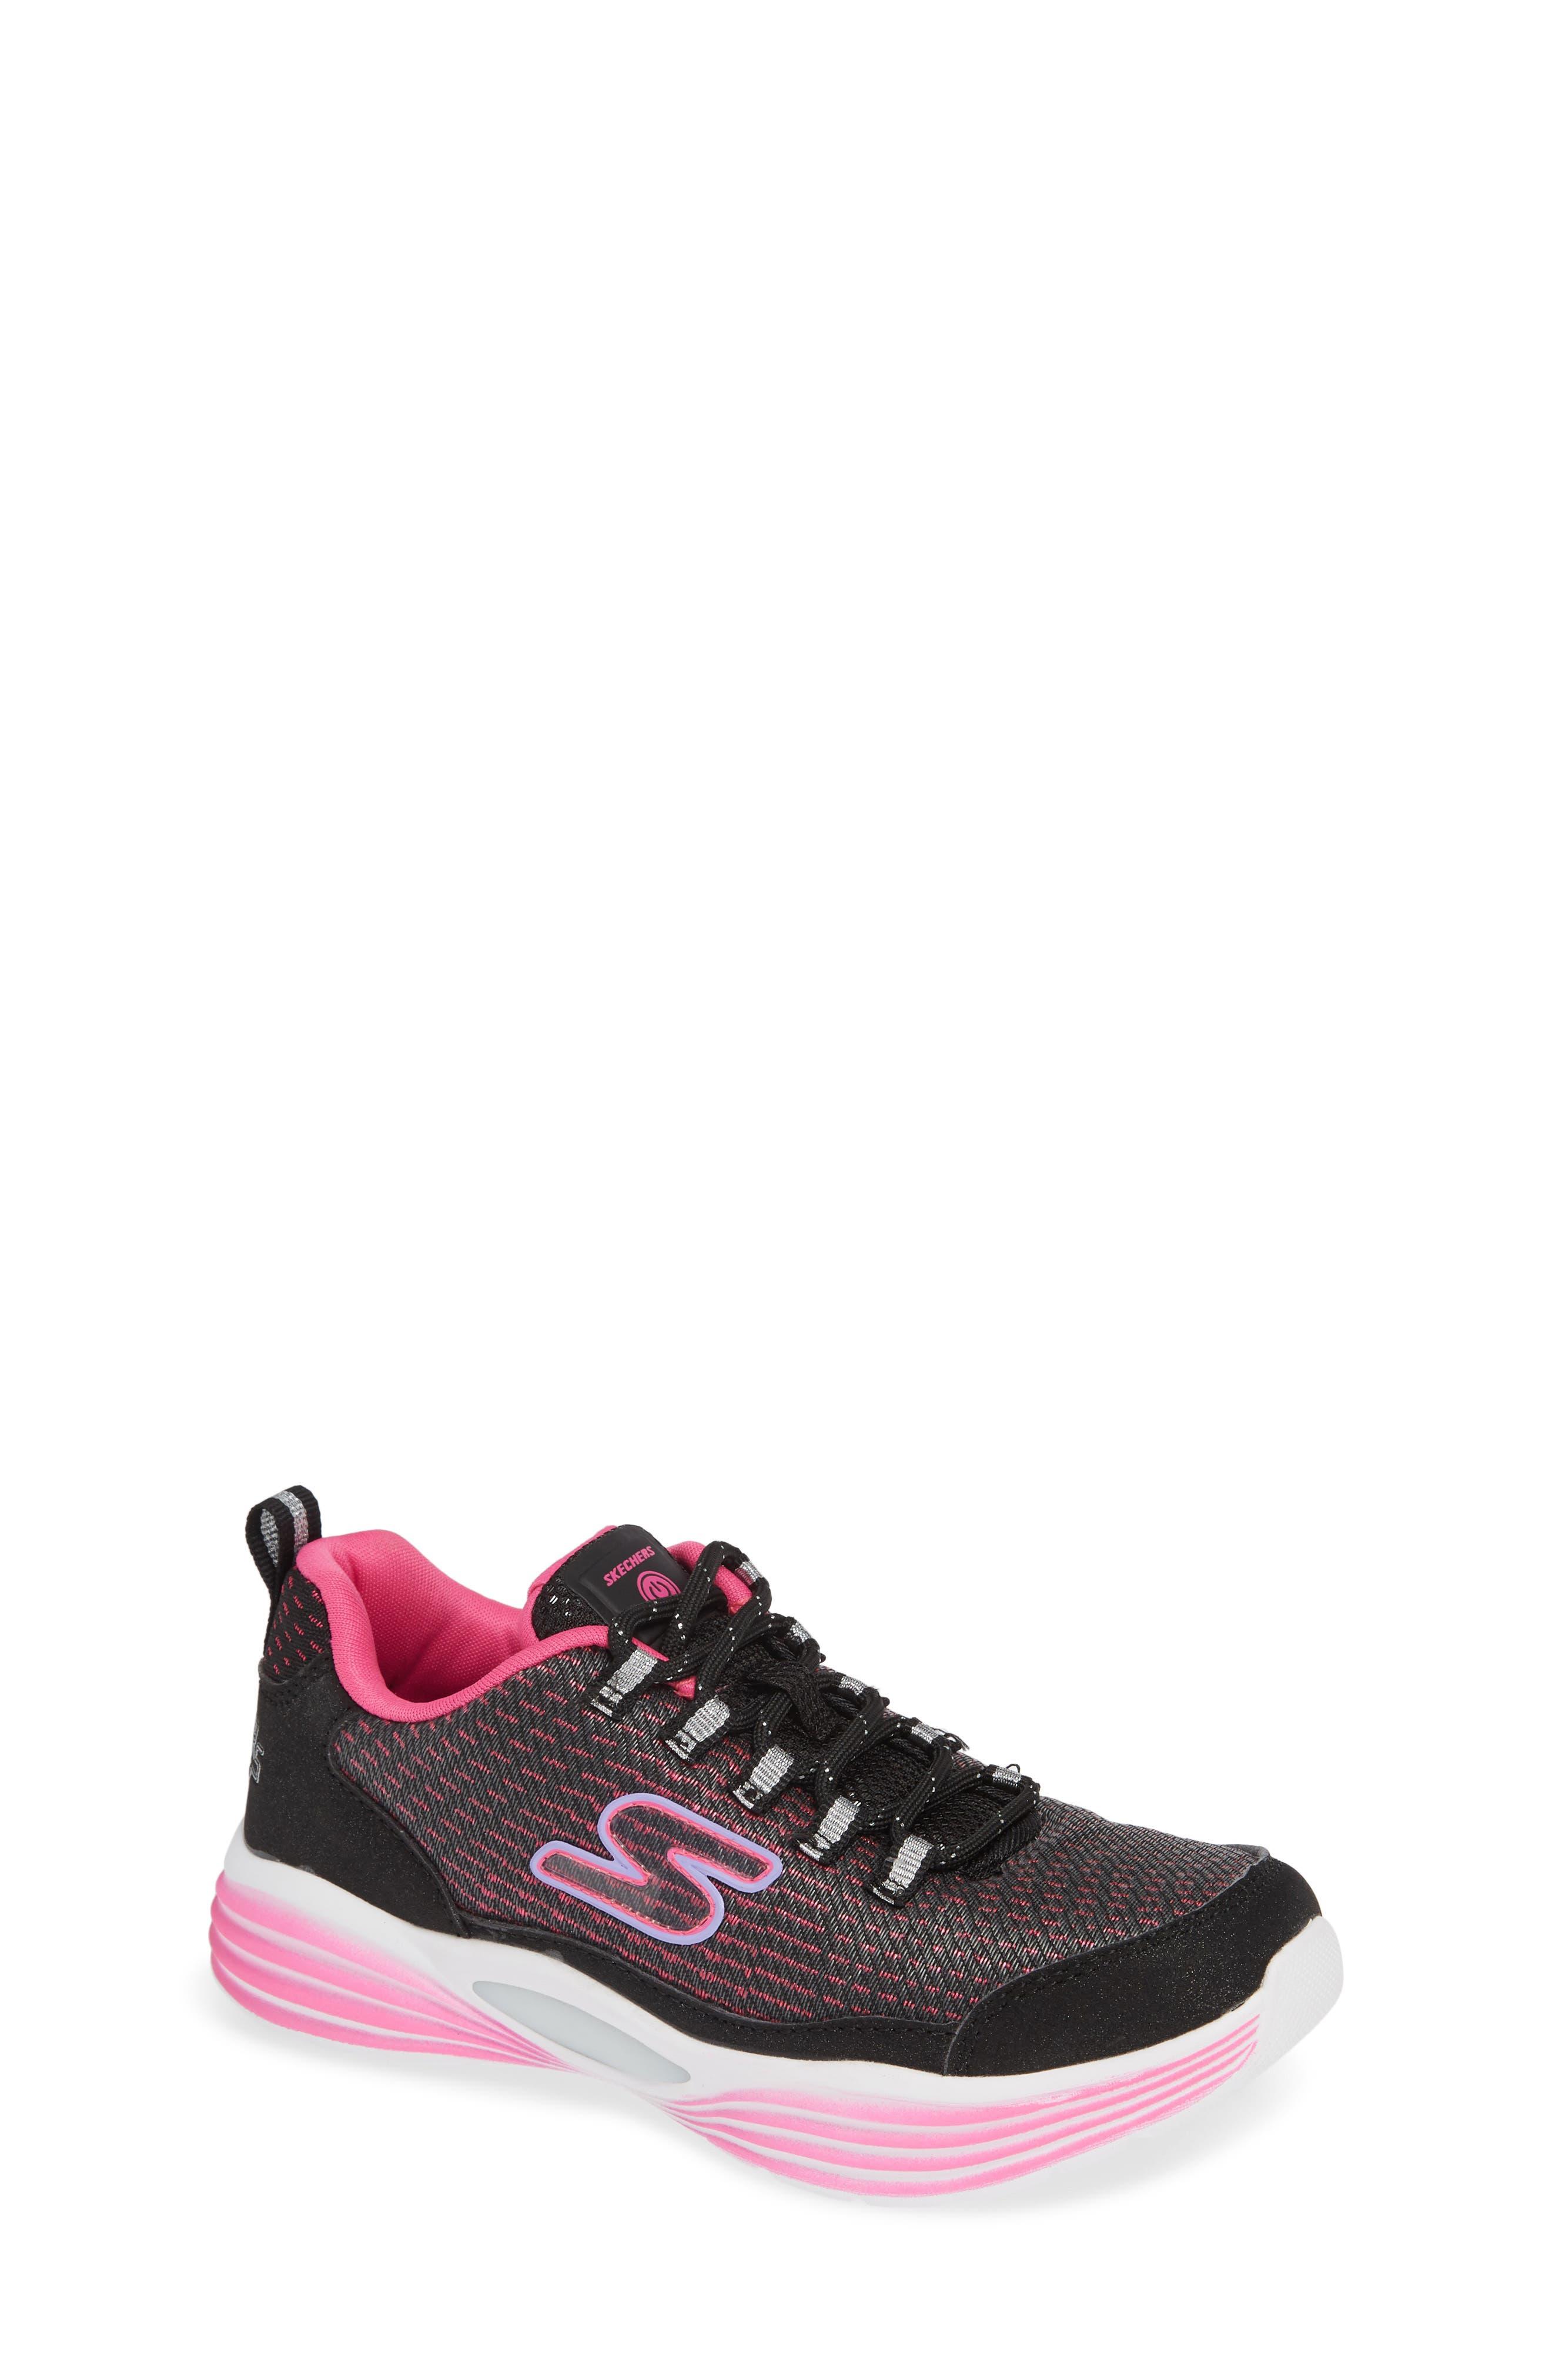 Luminator Light Up Sneaker,                             Main thumbnail 1, color,                             BLACK/ PINK